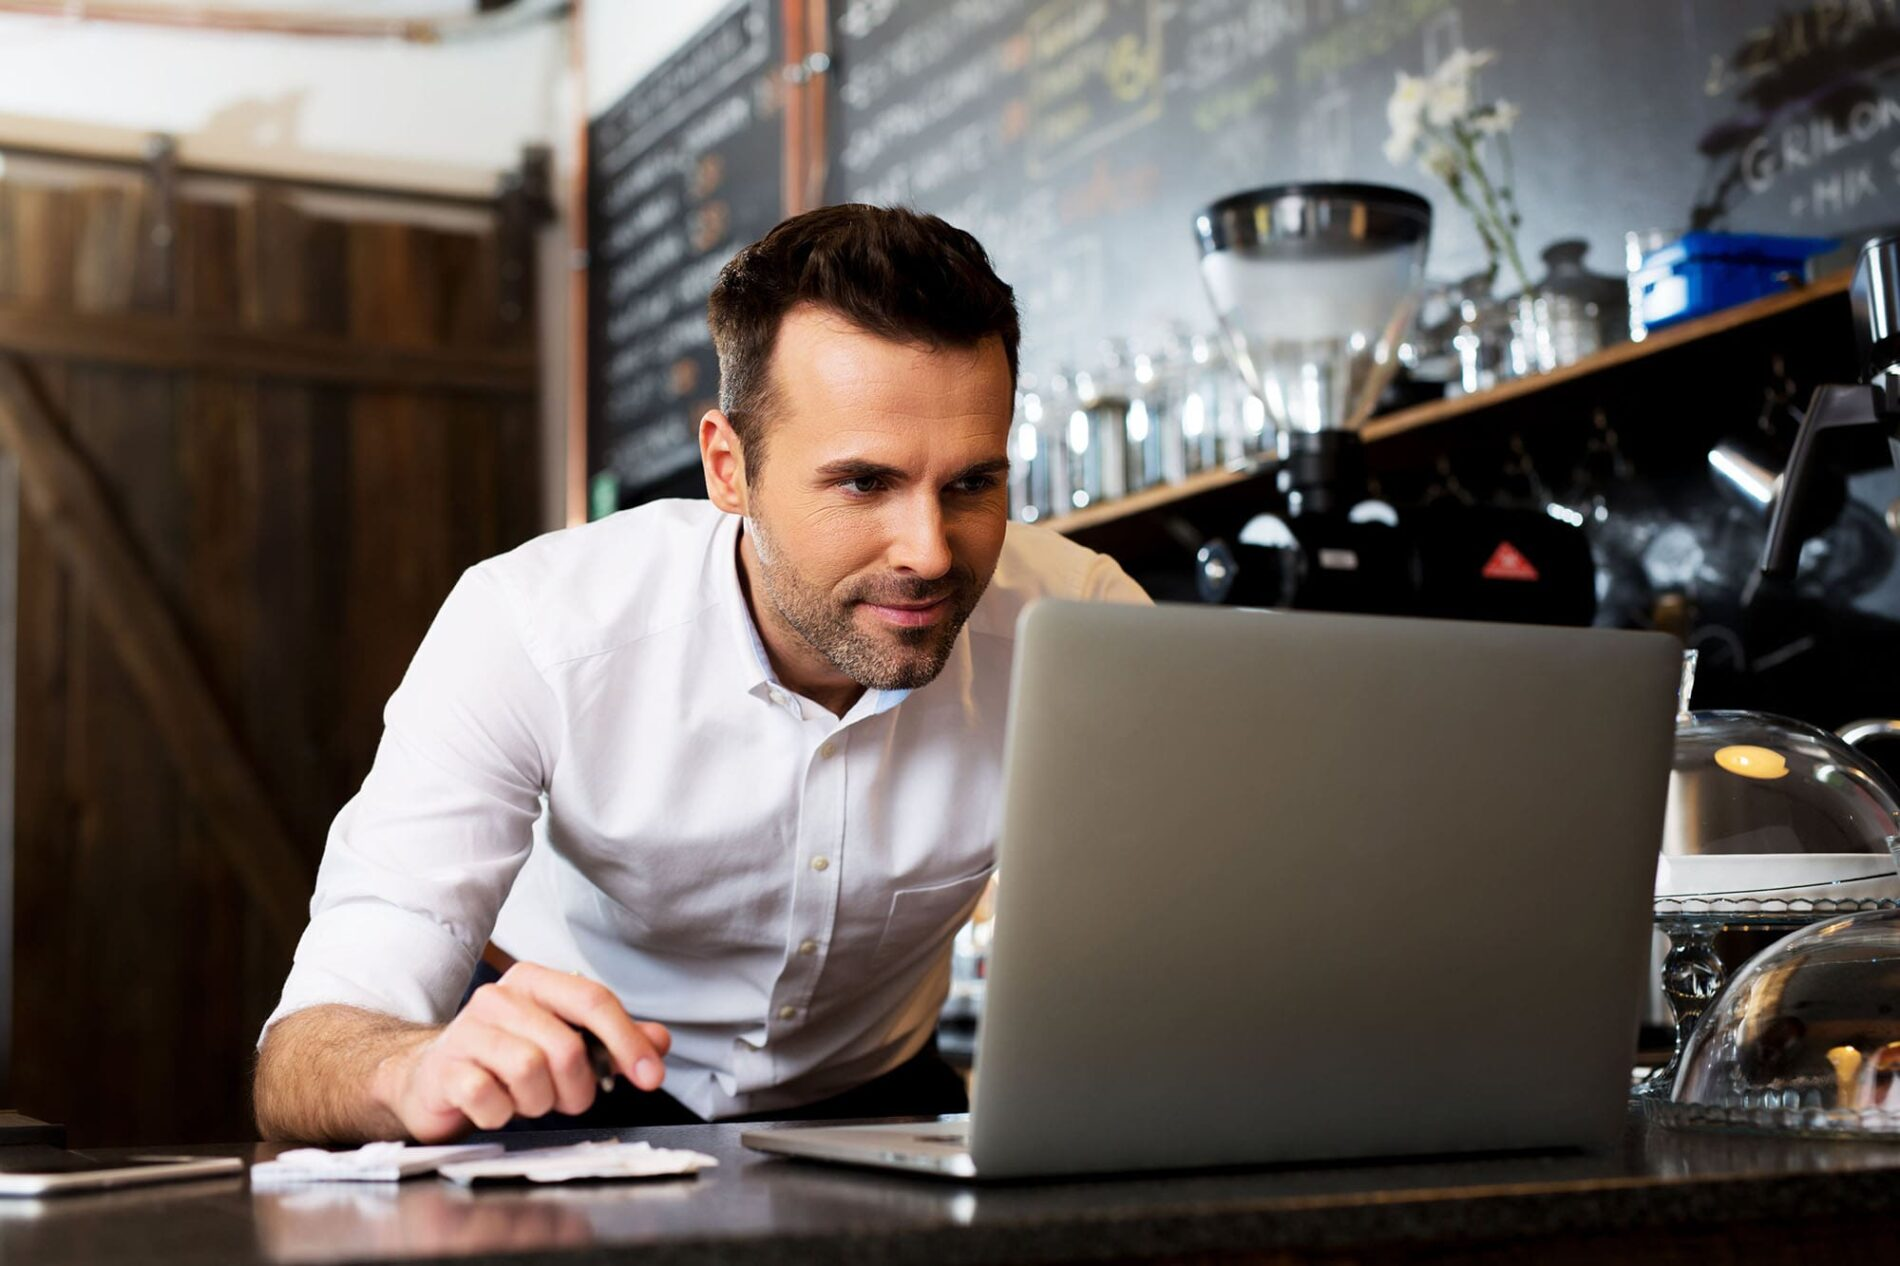 Resto Manager Checking Online Reviews | Tulumi Digital Marketing